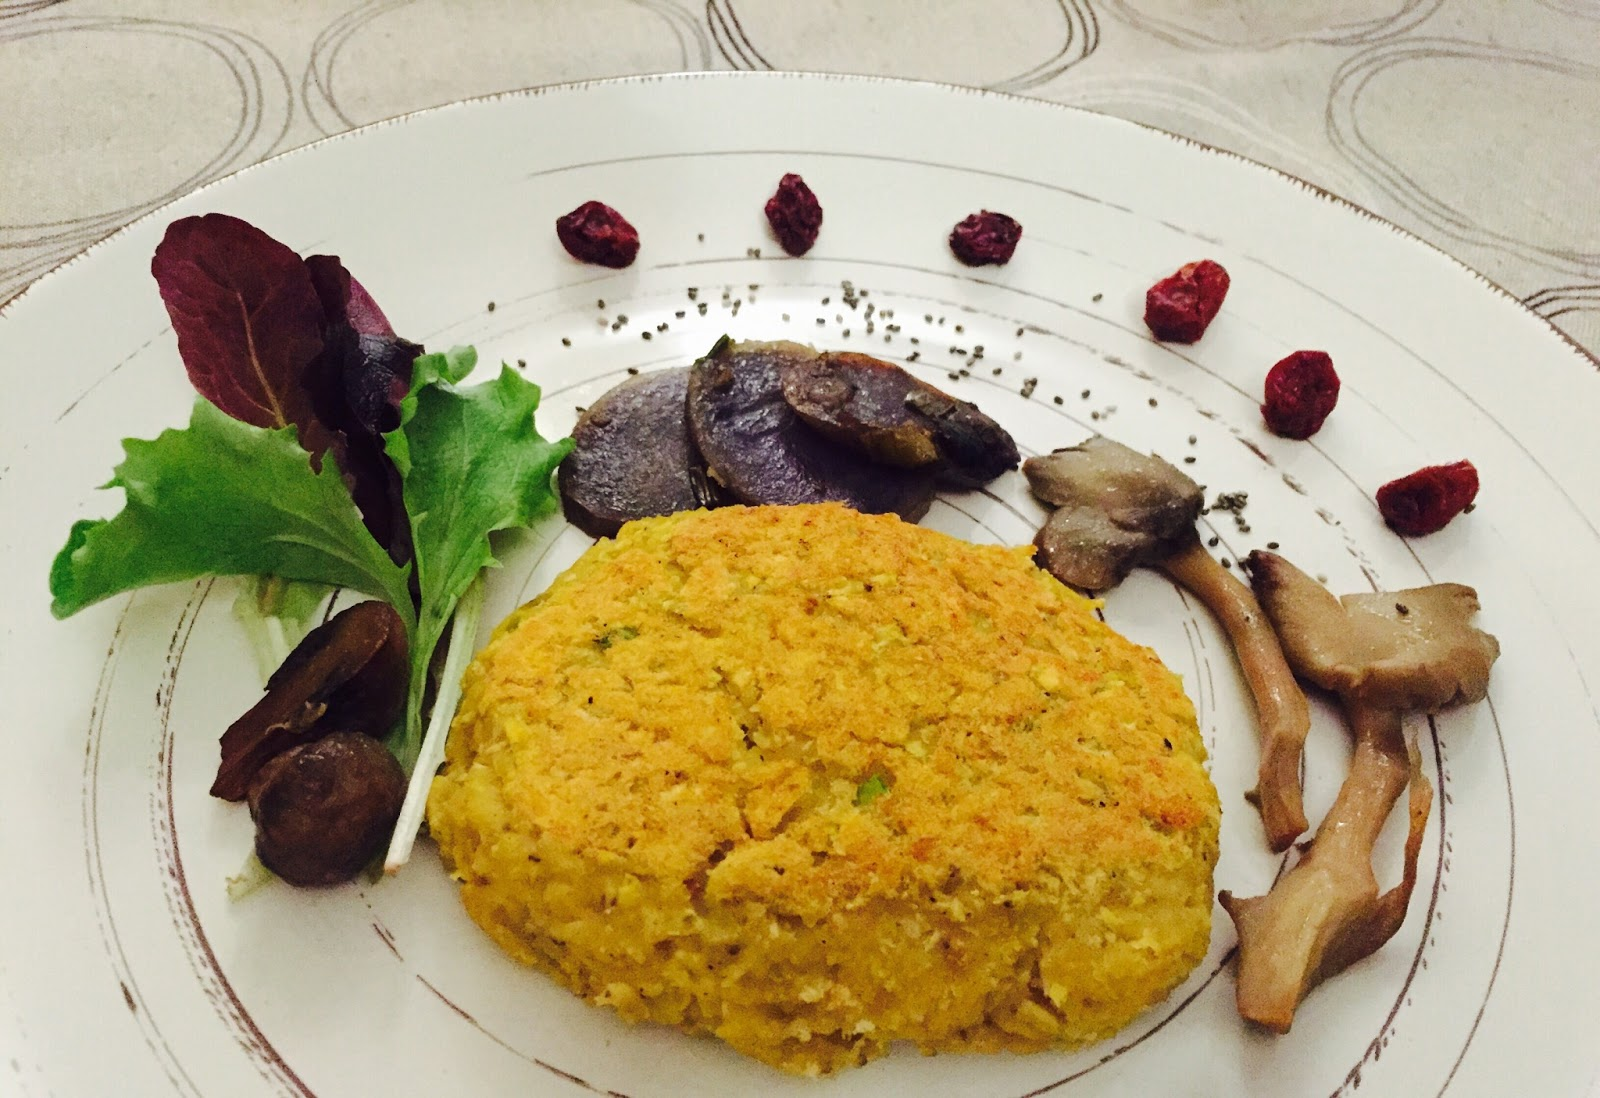 Hamburger vegetariano di lenticchie rosse decorticate for Cucinare vegetariano